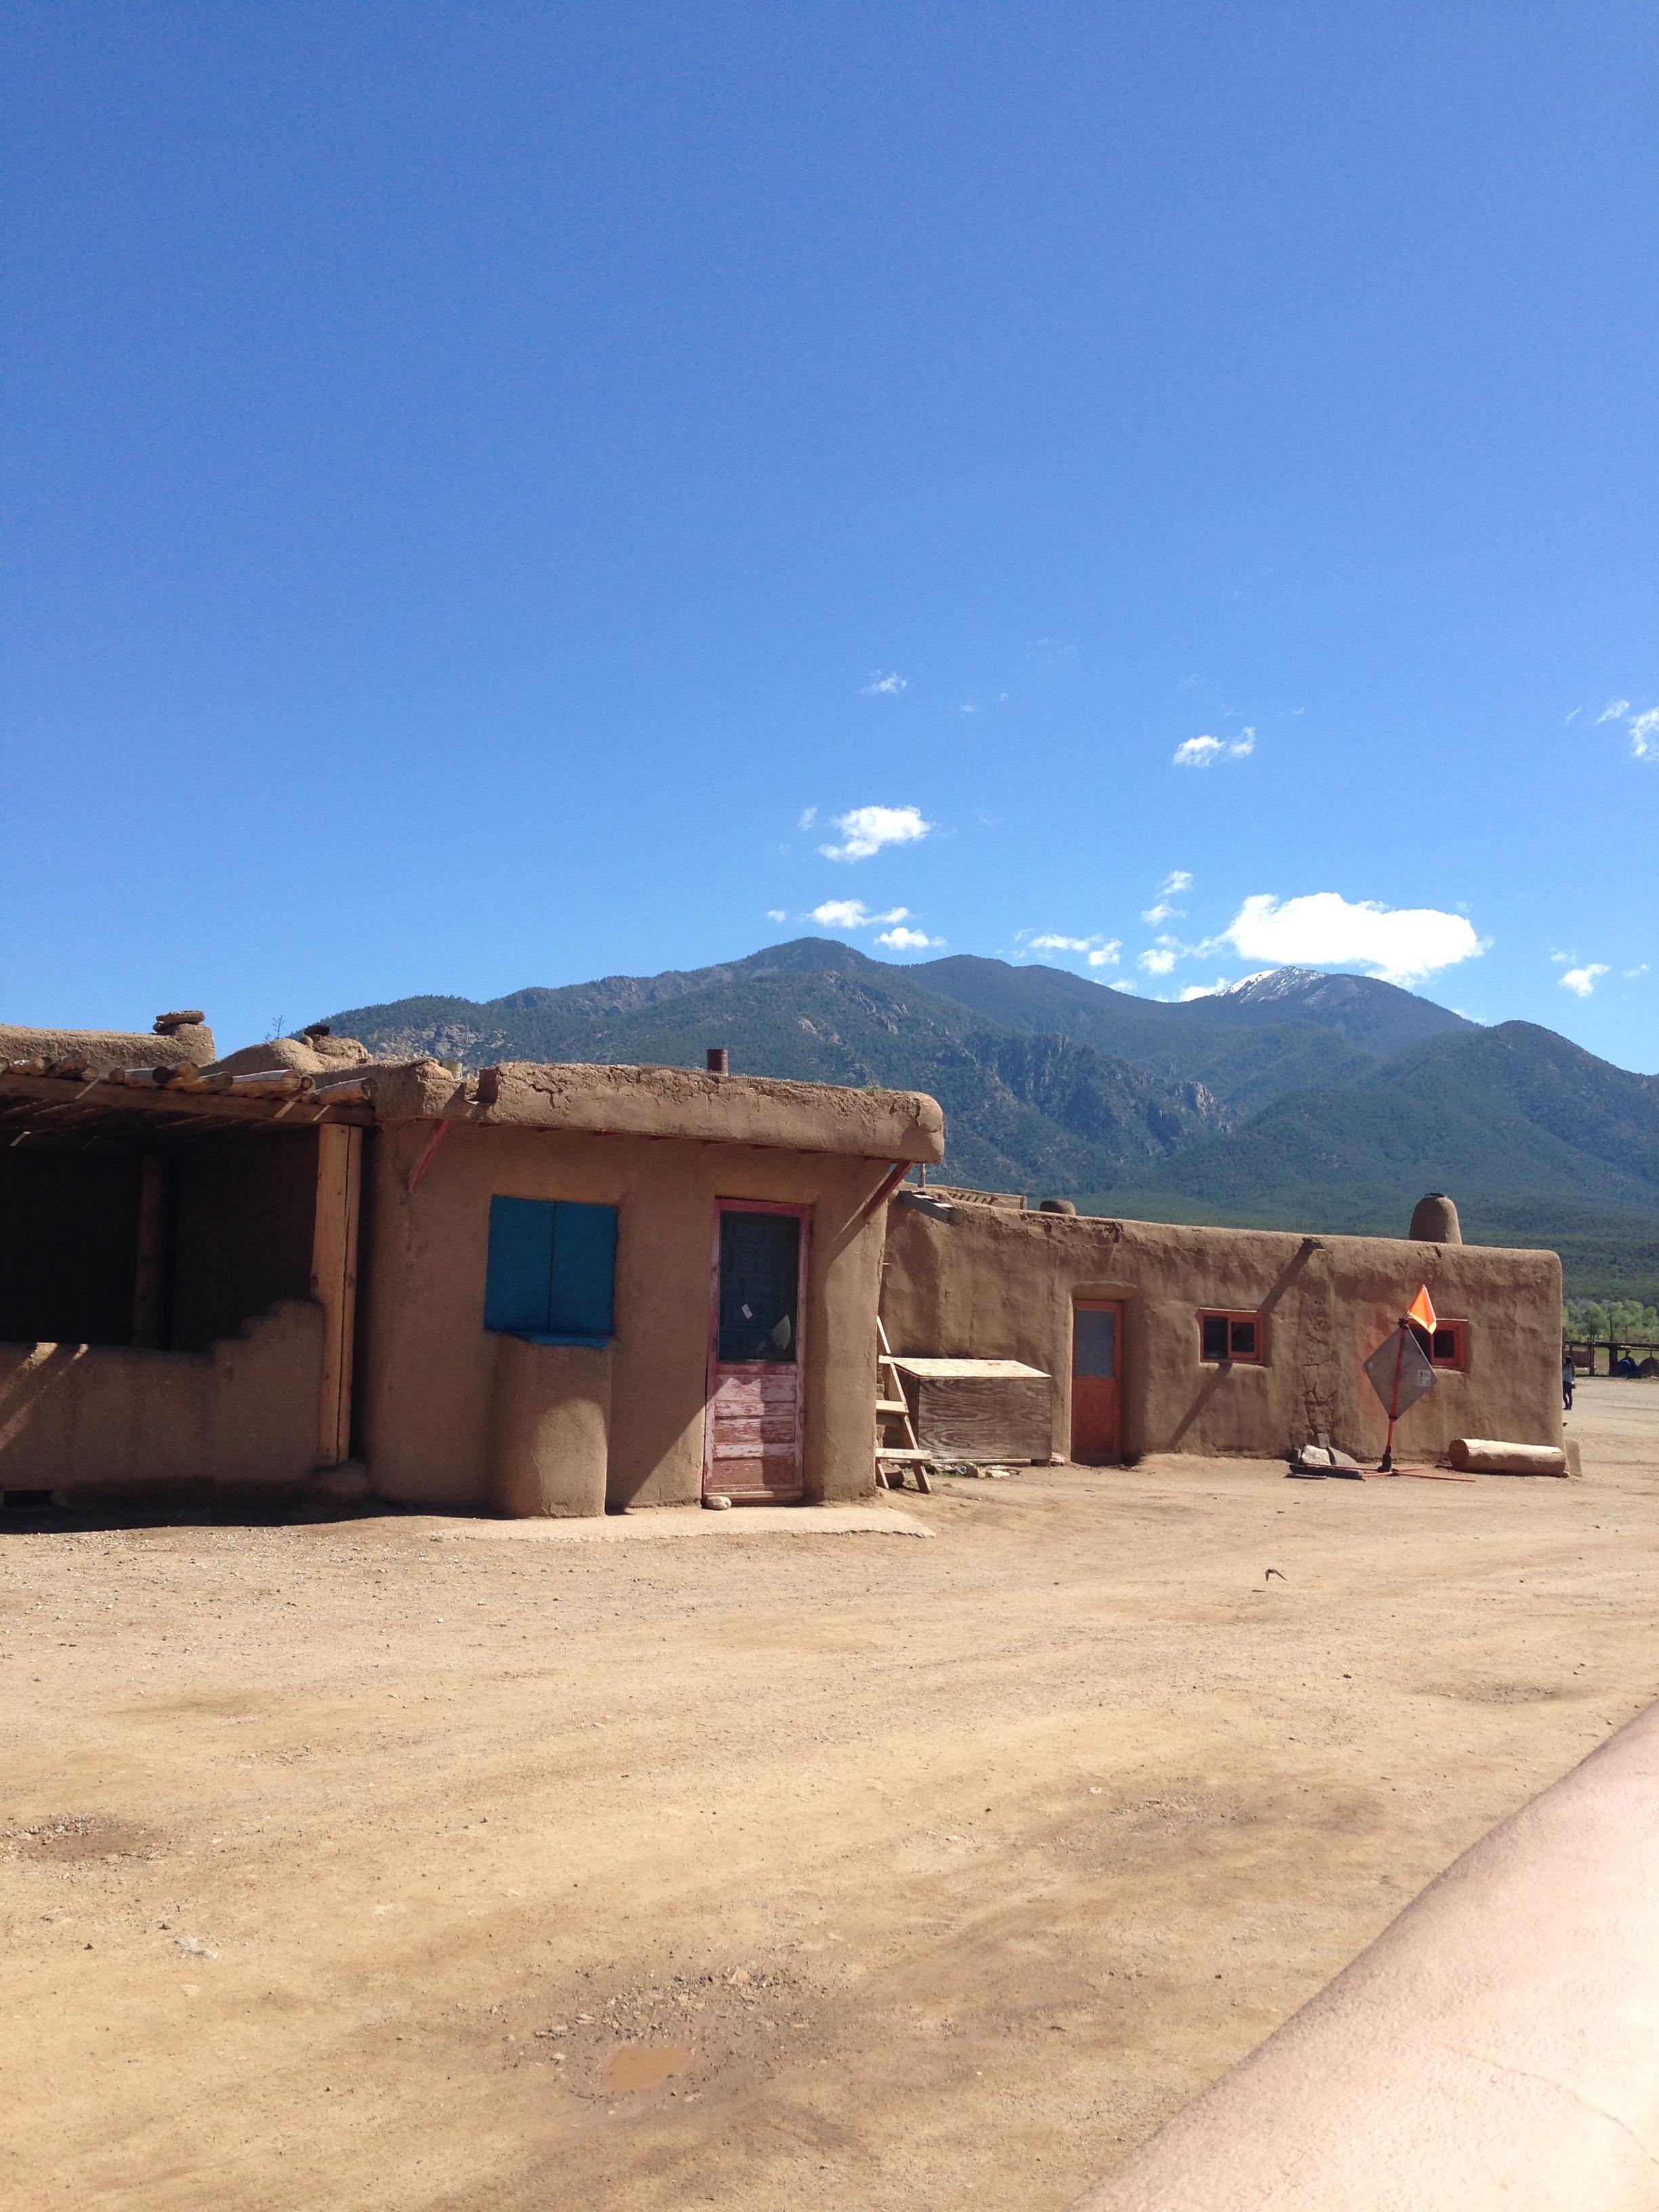 adobe buildings at the Taos Pueblo in New Mexico